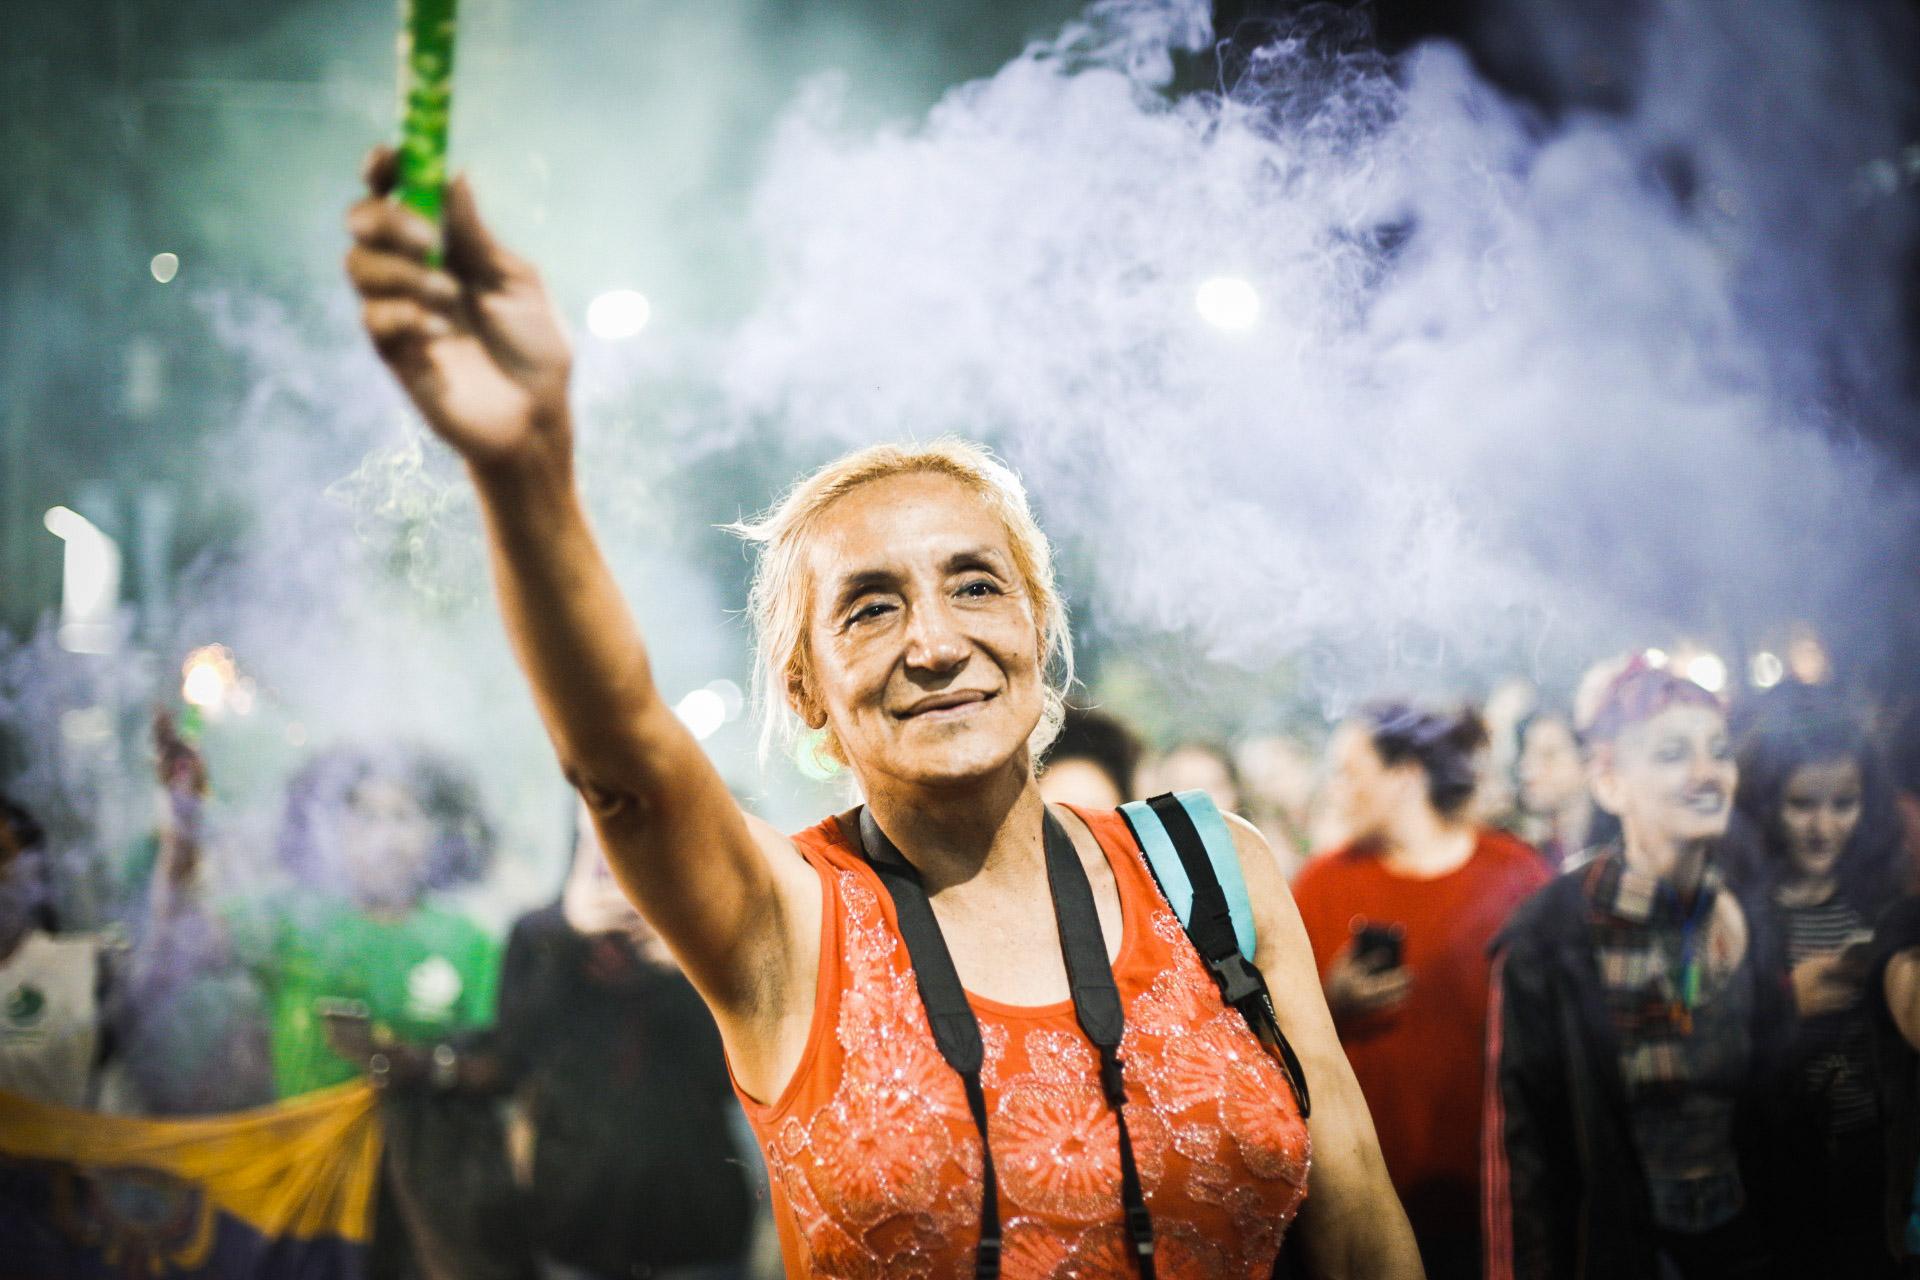 Las bengalas encendieron la noche en La Plata